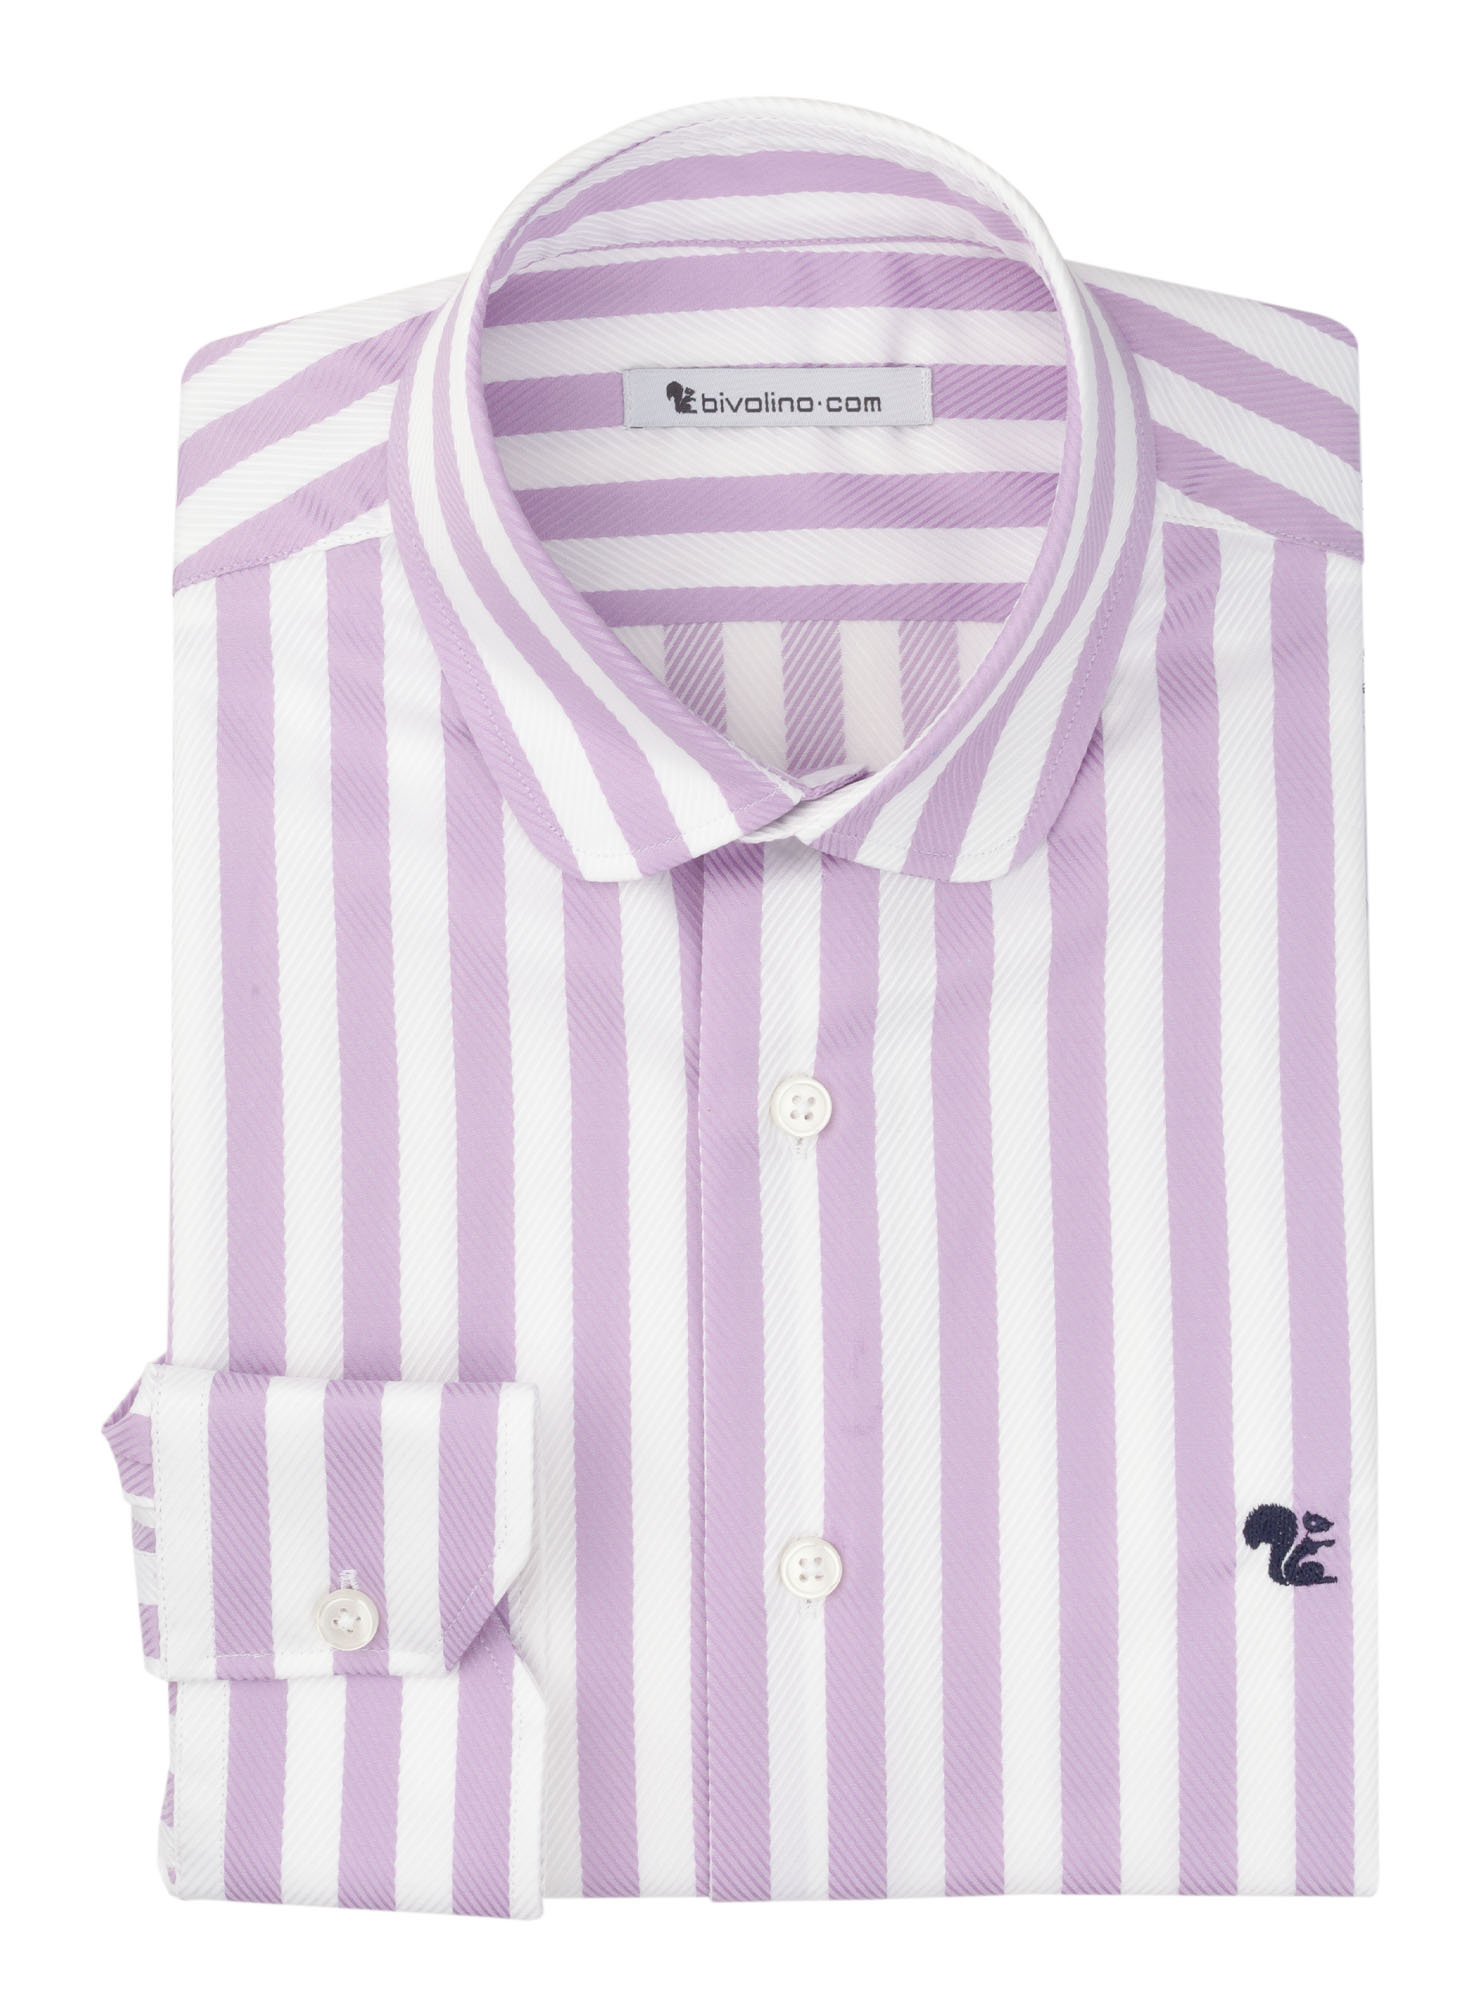 BASCHI - chemise homme lila rayure transat double retors supima satinée - CALVO 6